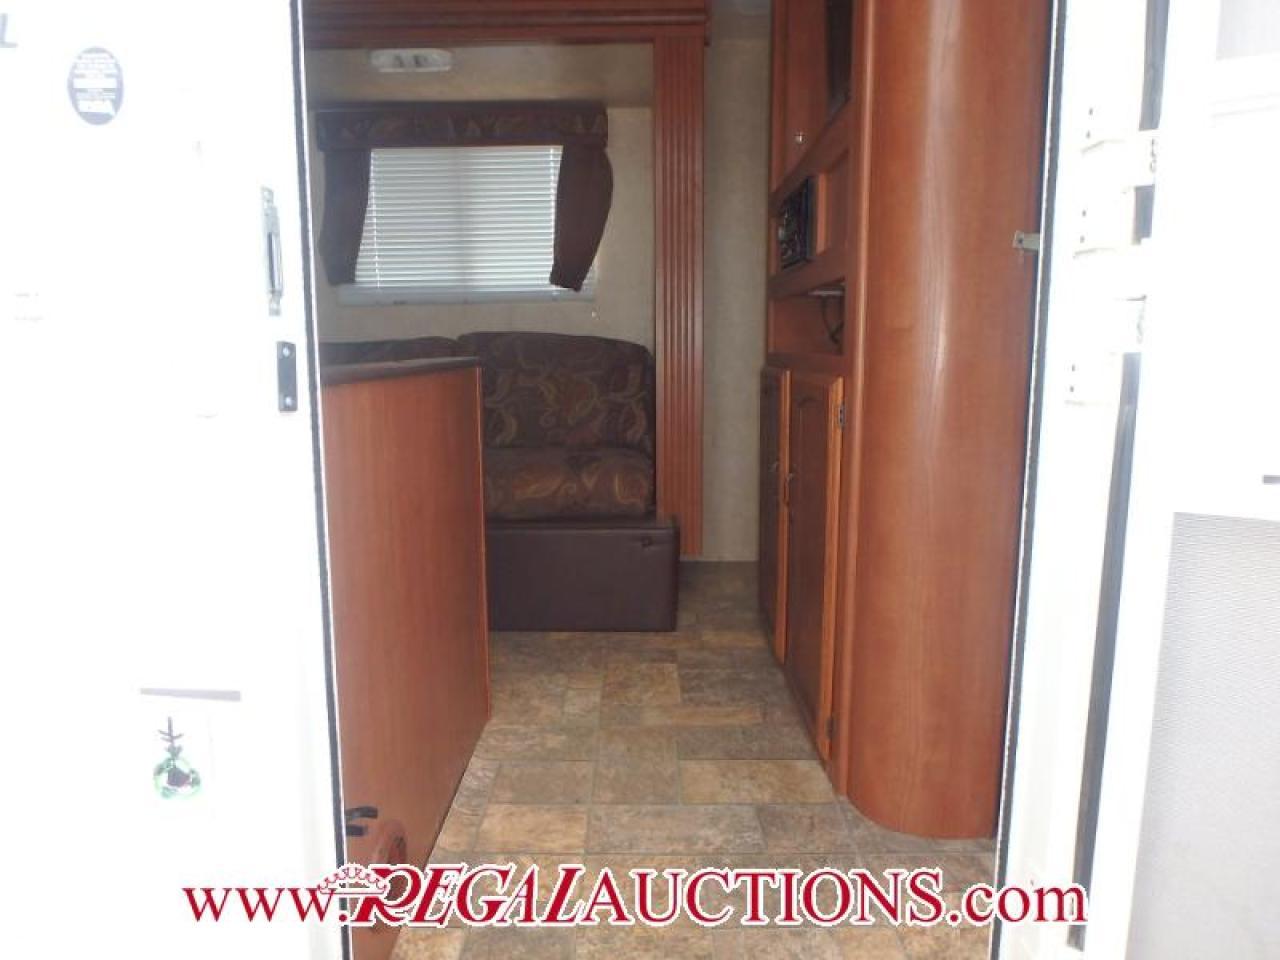 2013 SALEM CRUISE LITE T281QBXL  TRAVEL TRAILER